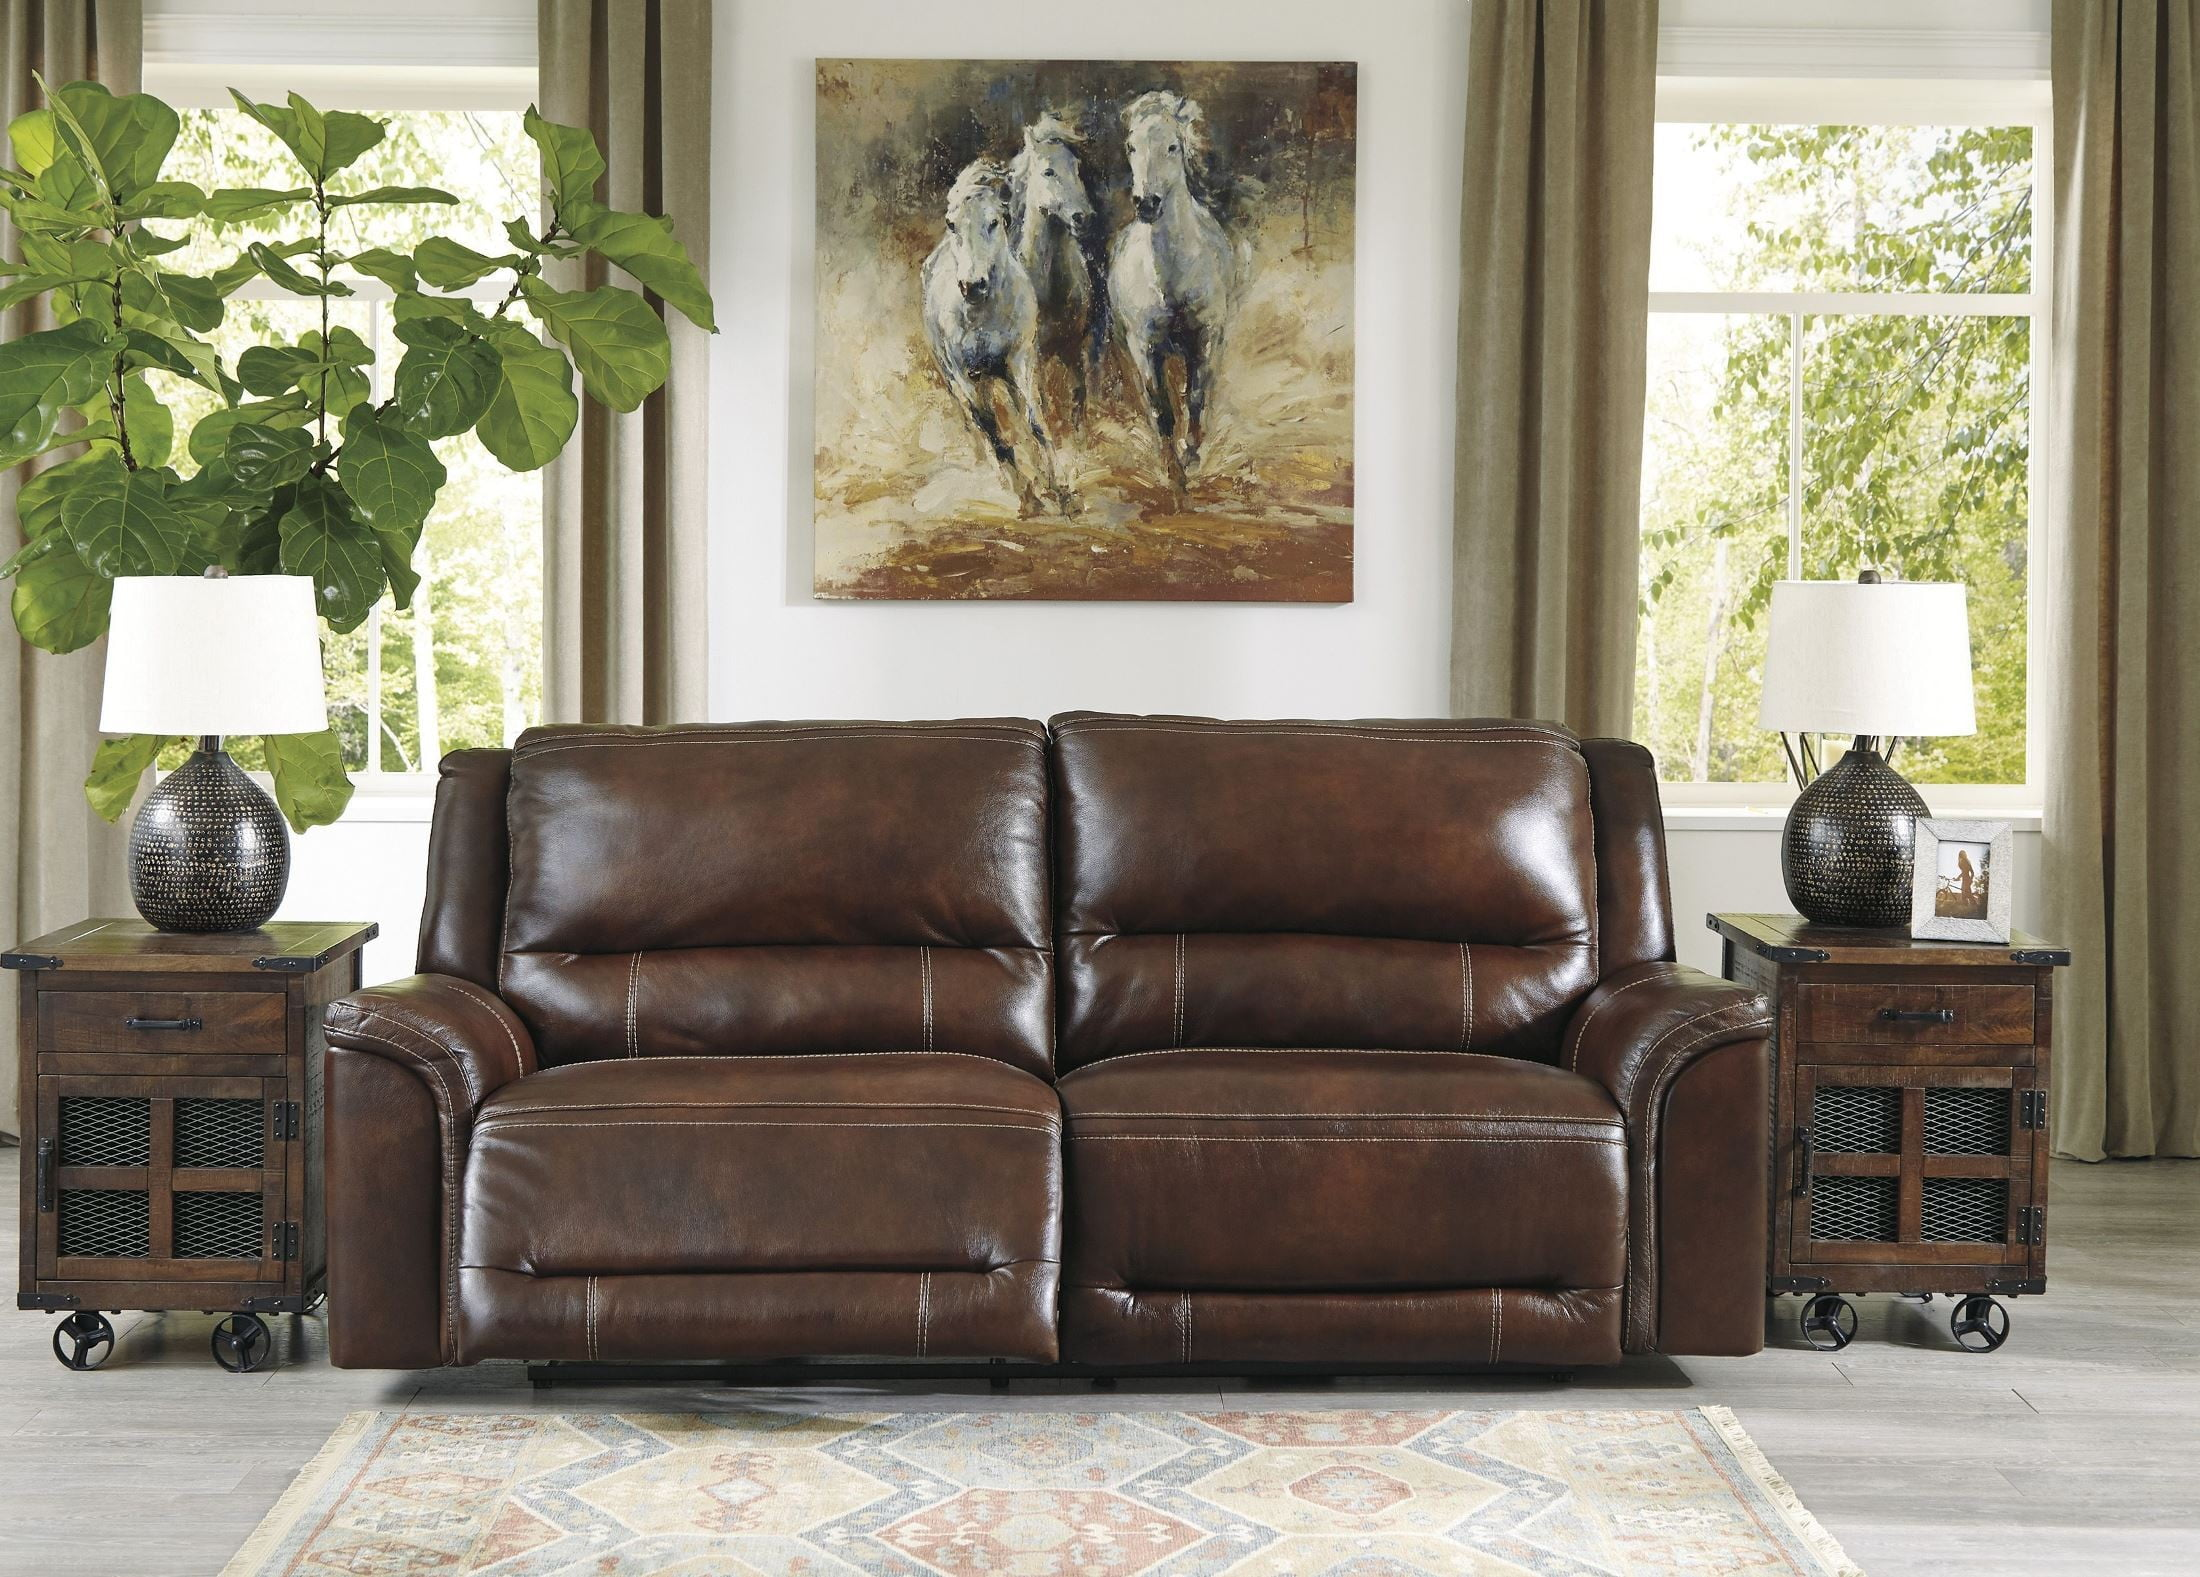 Peachy Catanzaro Mahogany 2 Seat Power Reclining Sofa With Adjustable Headrest Machost Co Dining Chair Design Ideas Machostcouk